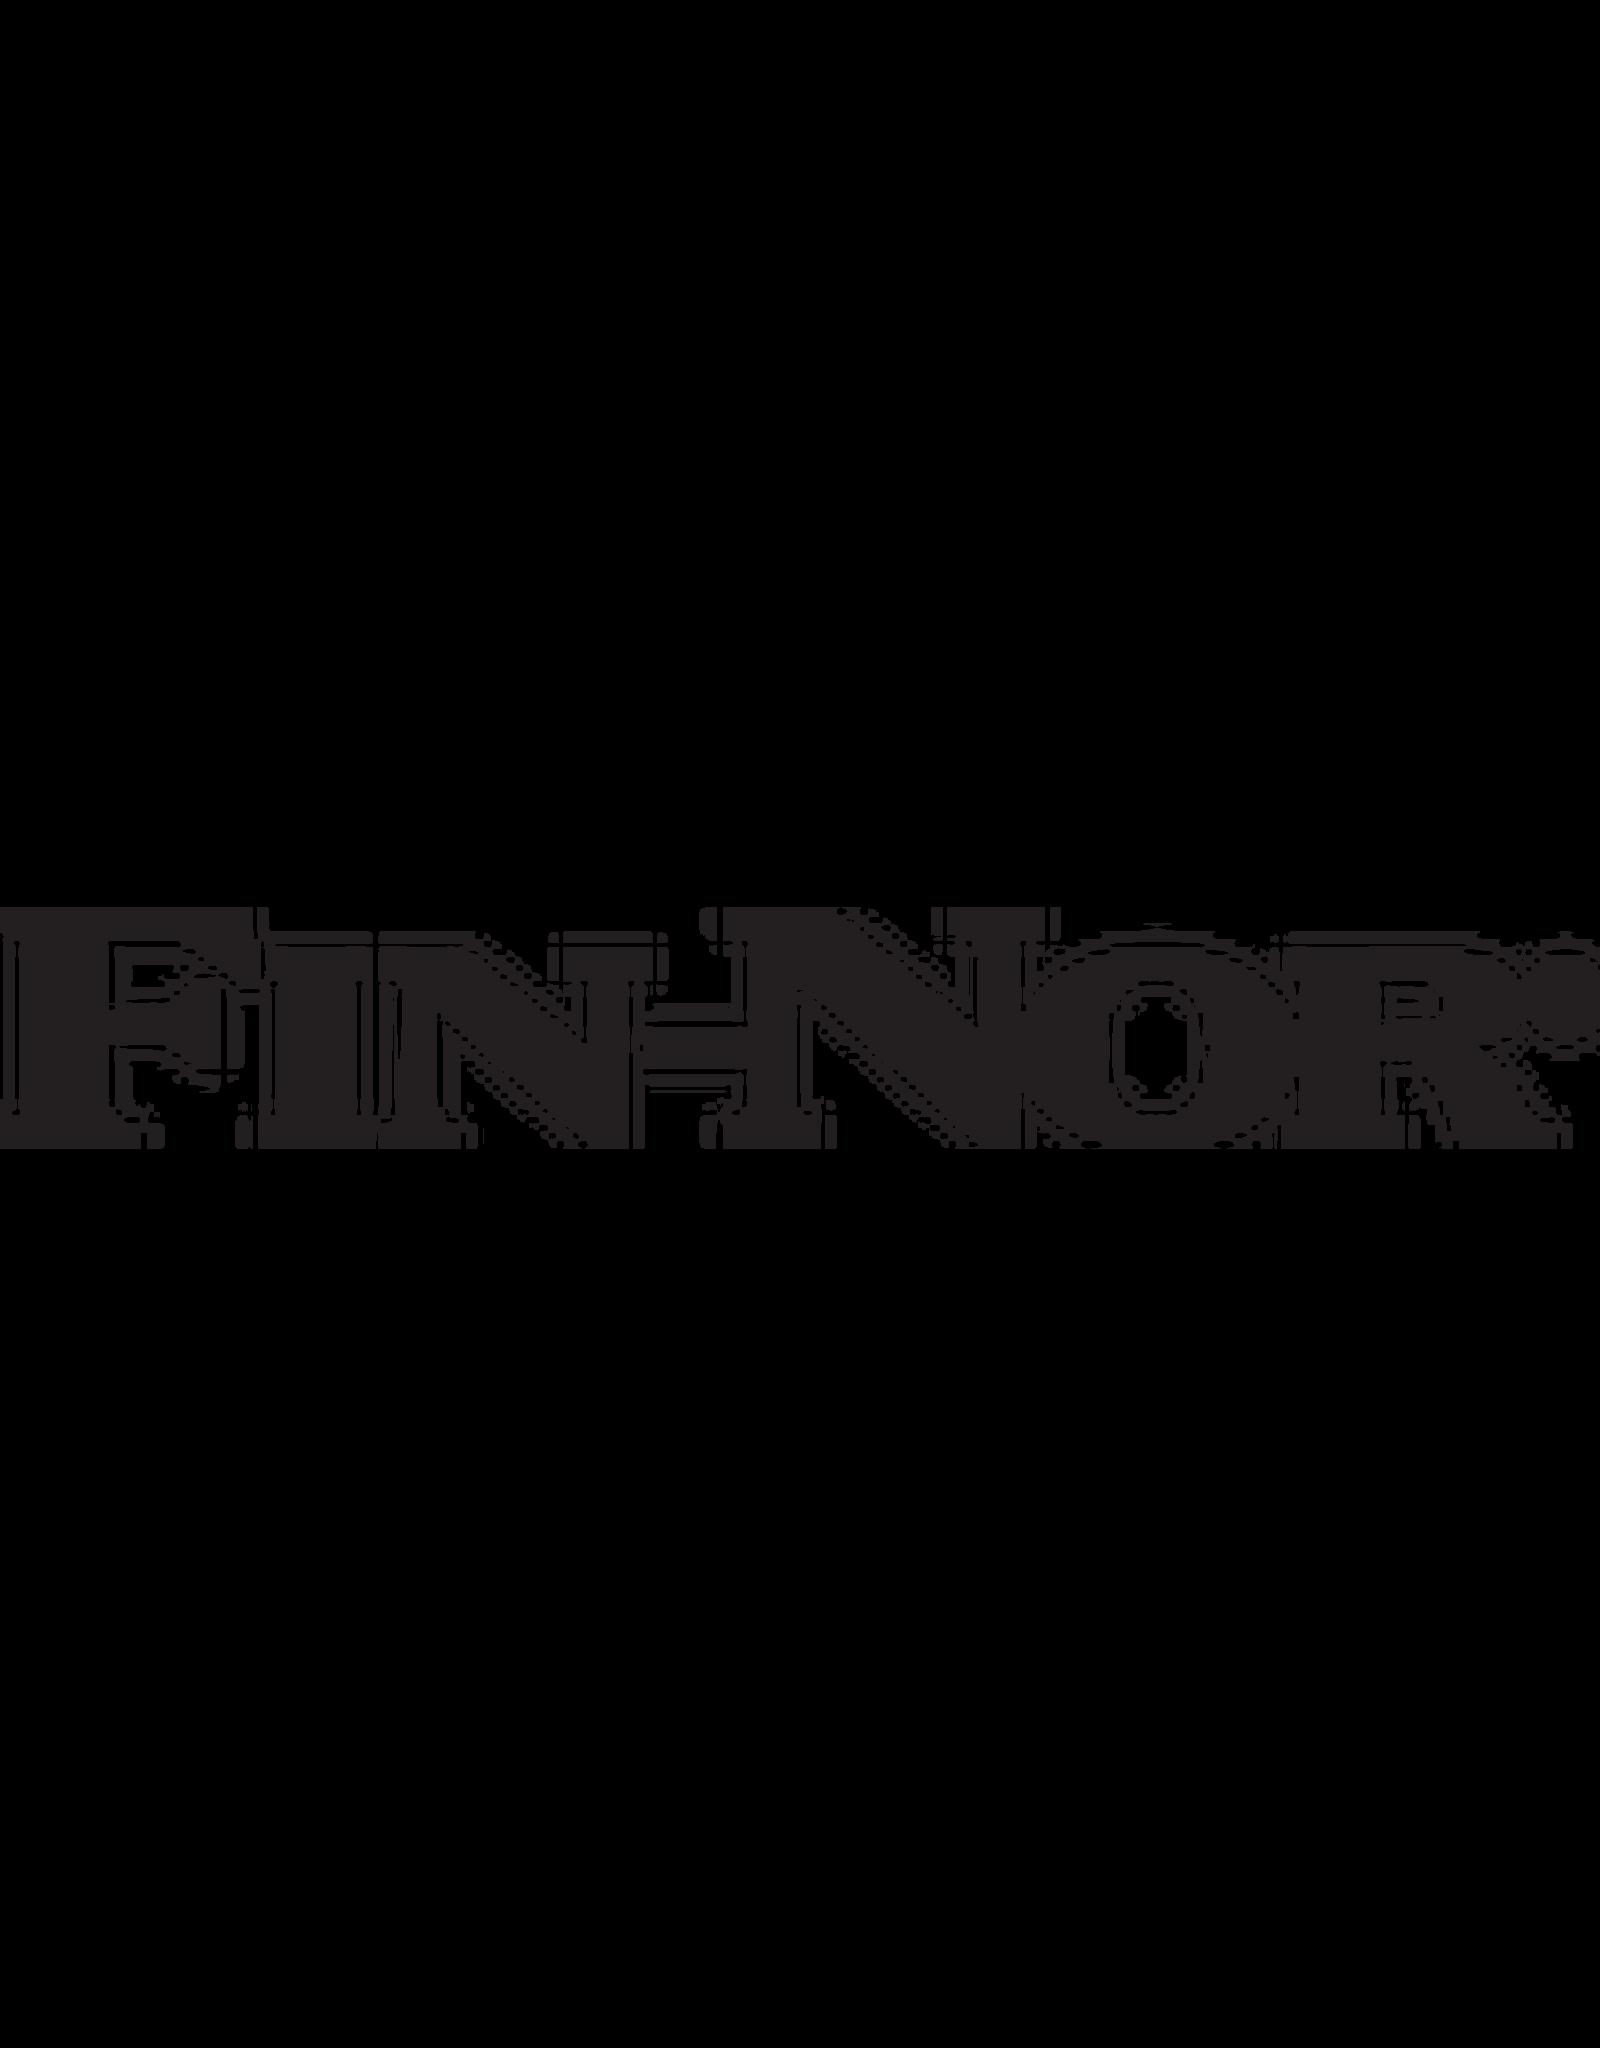 Fin-Nor BEARING WASHER